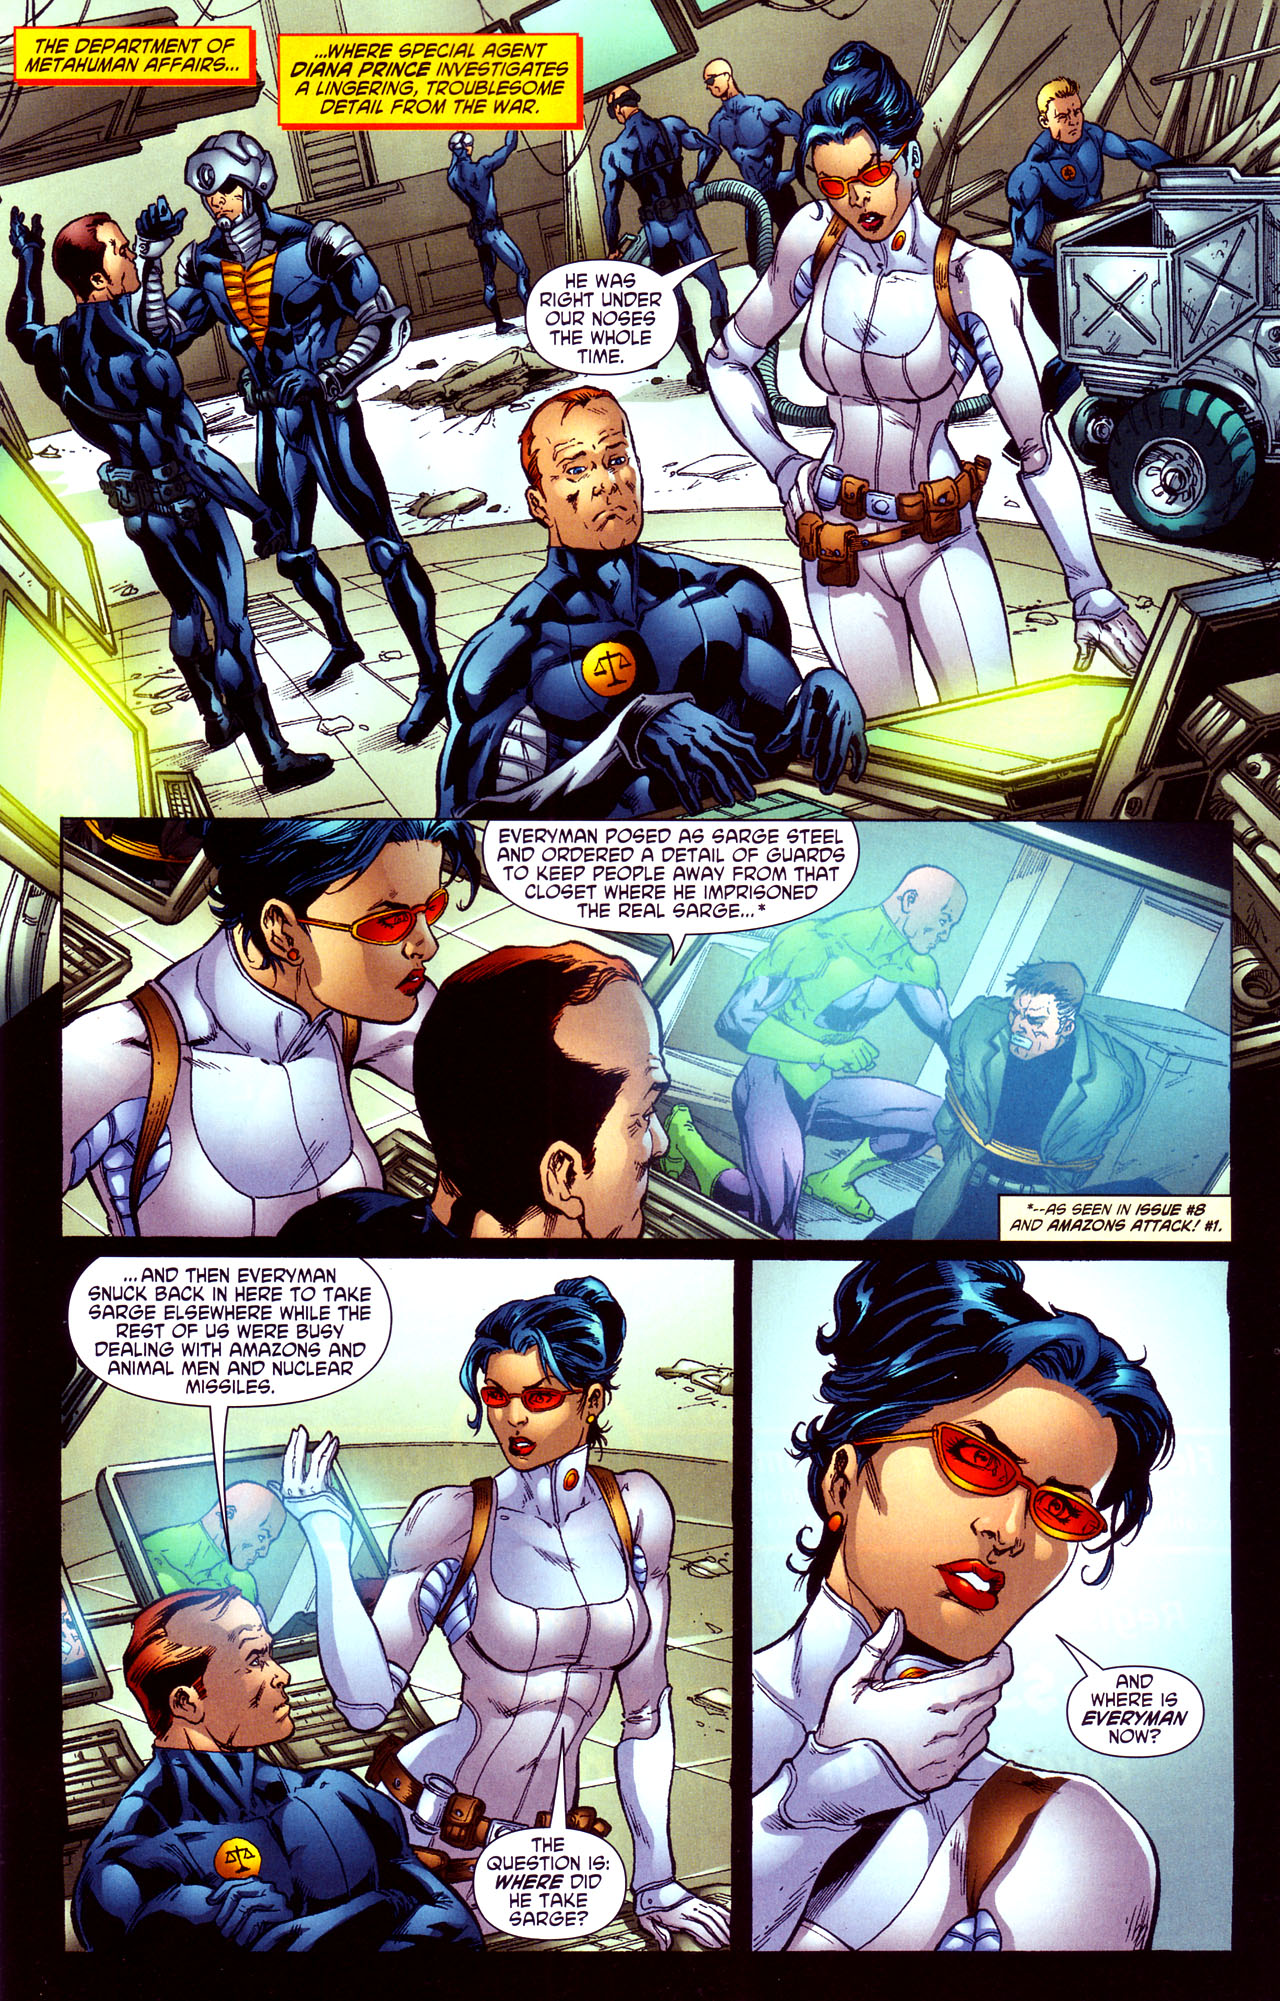 Read online Wonder Woman (2006) comic -  Issue #12 - 6